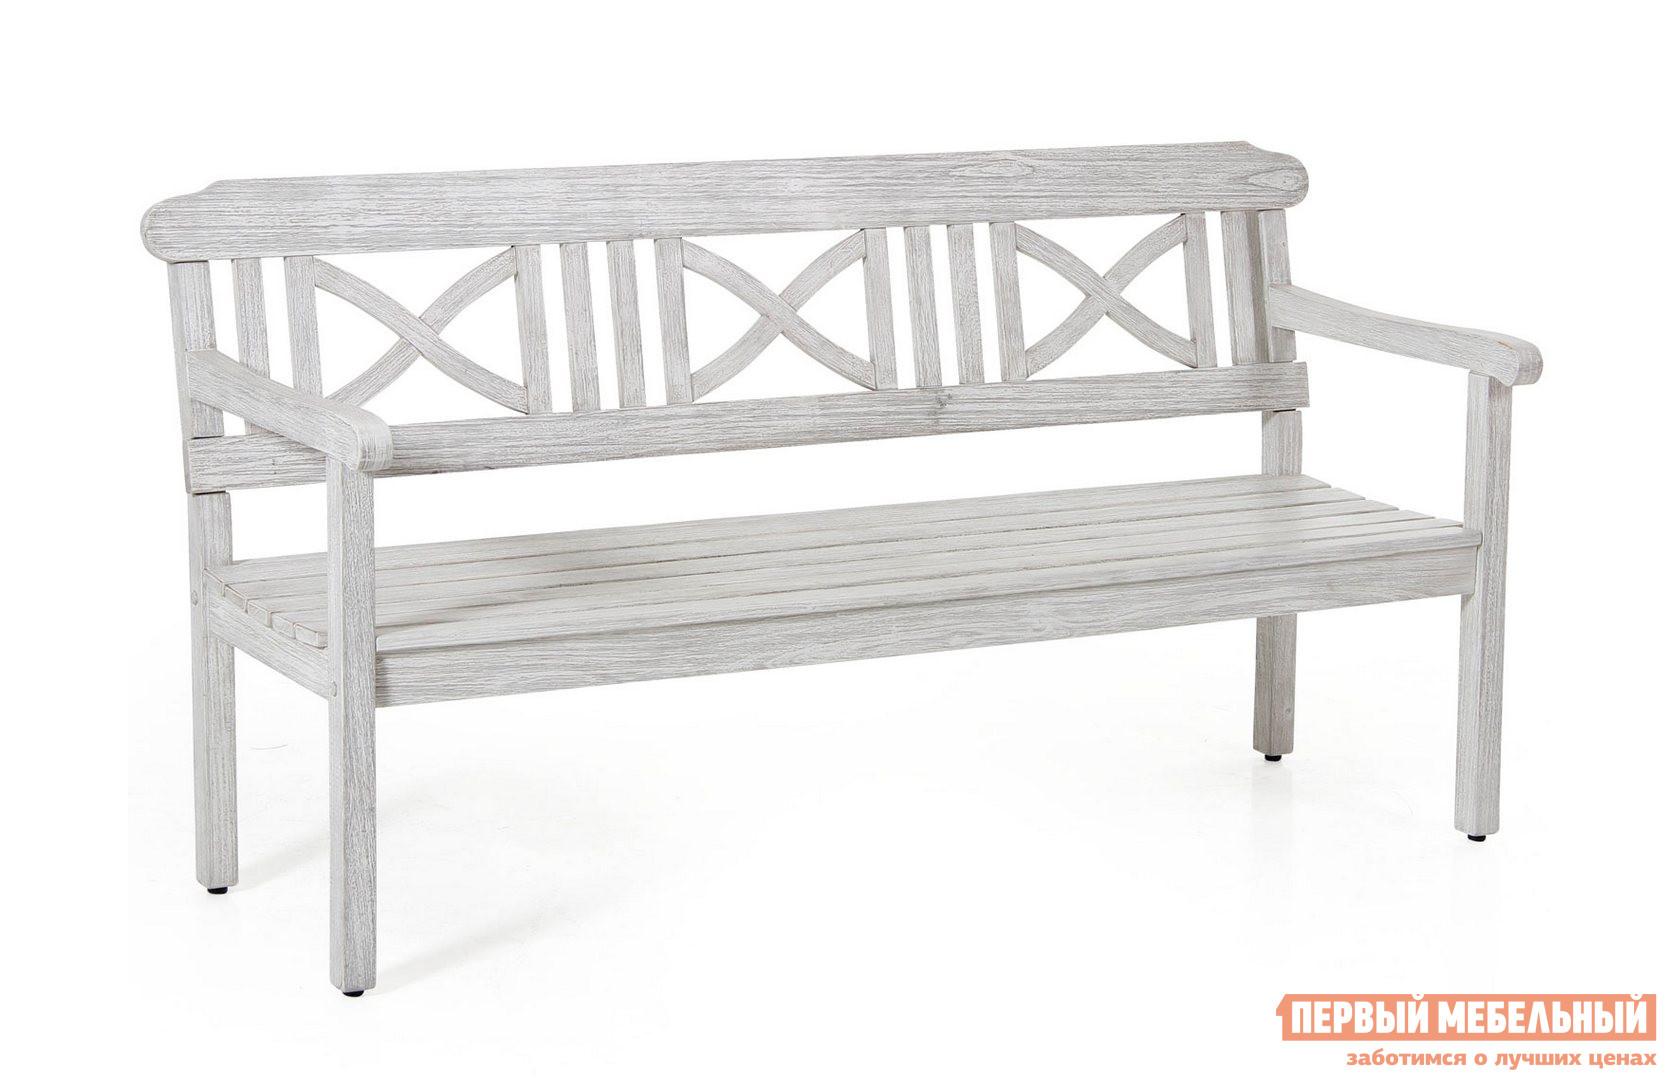 Скамейка Шведская линия Dakota 80573-50-25 скамейка